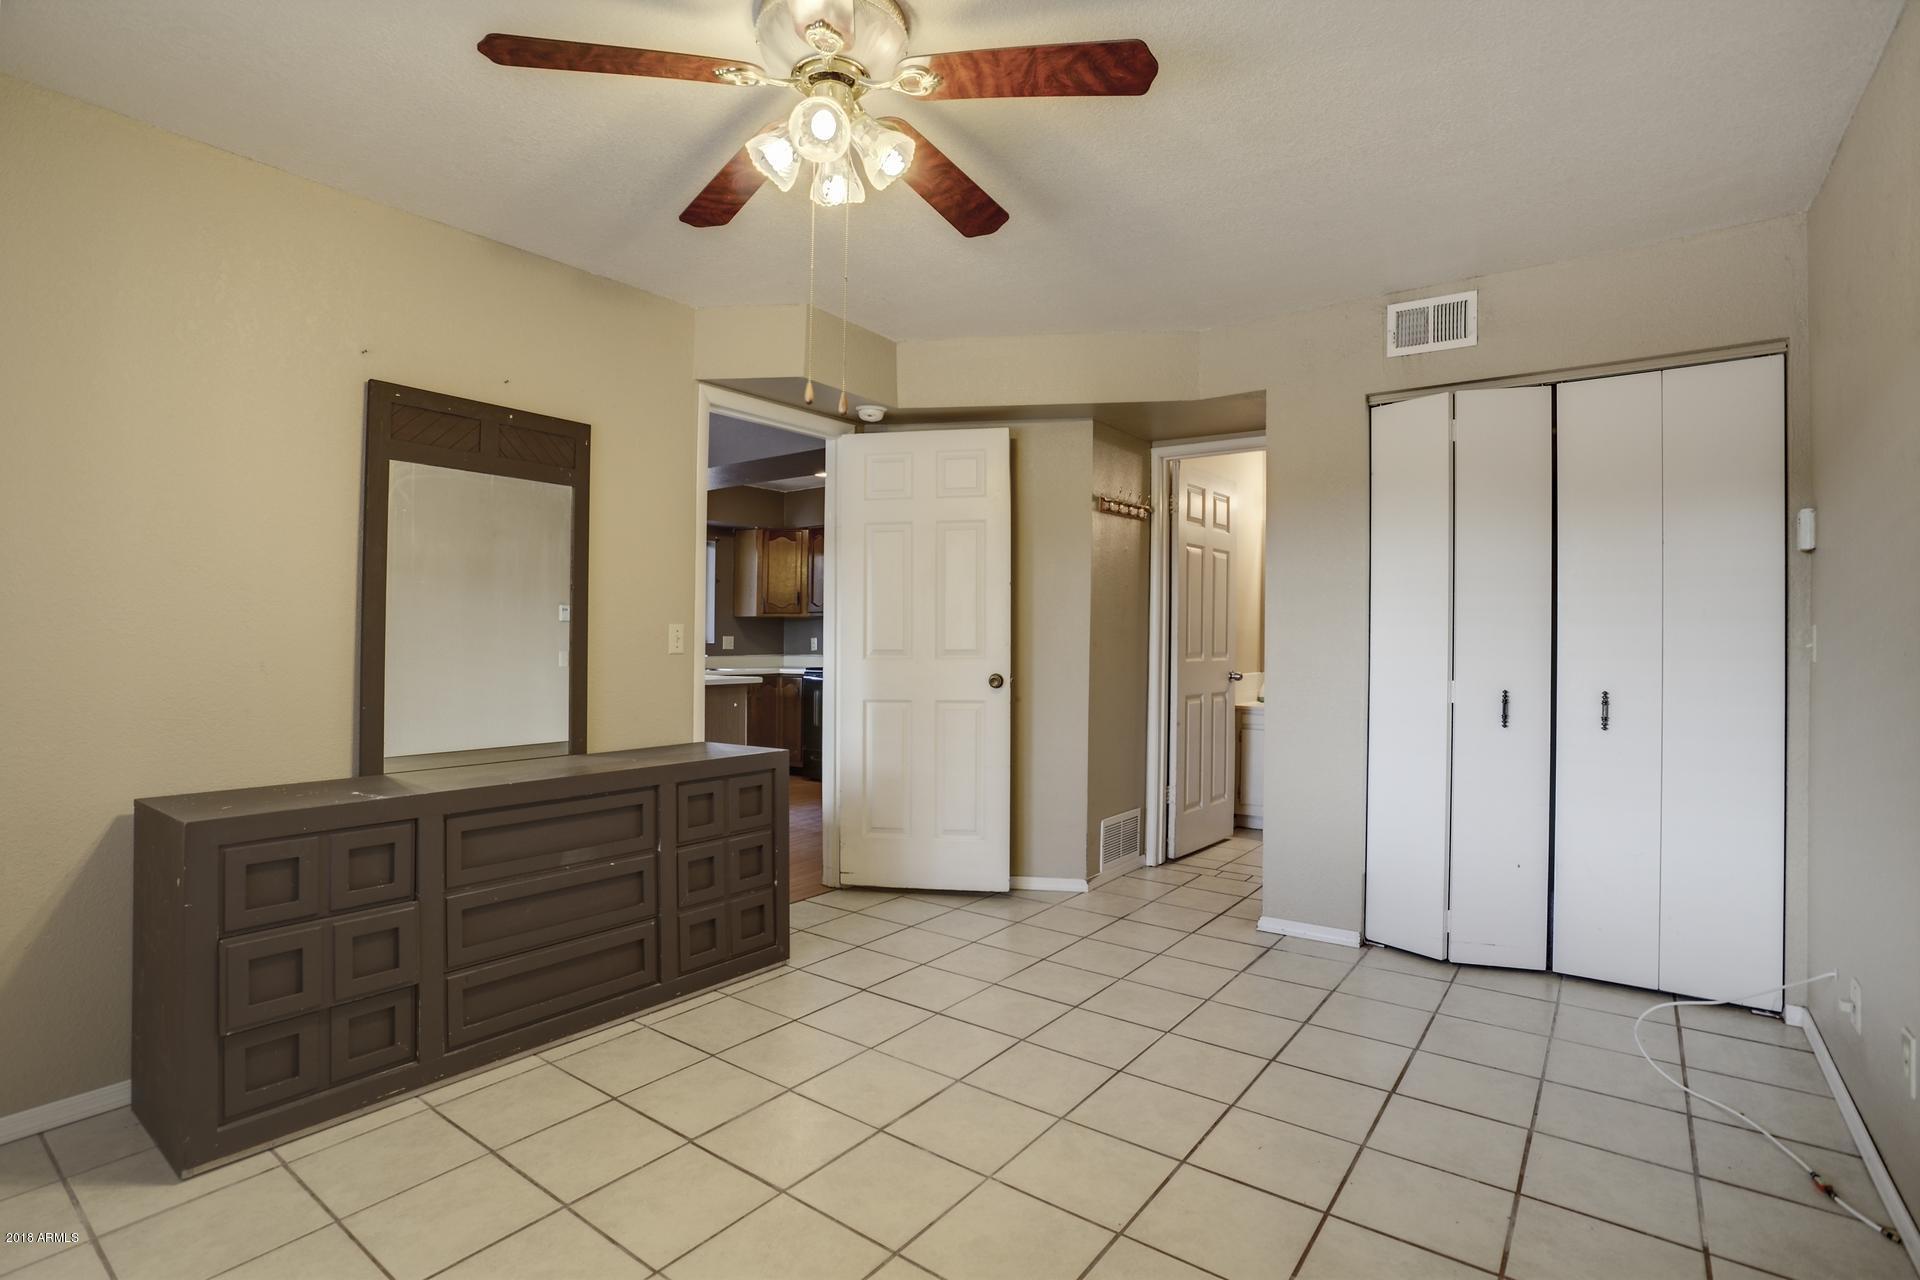 906 S Ridgeway Street Payson, AZ 85541 - MLS #: 5741318